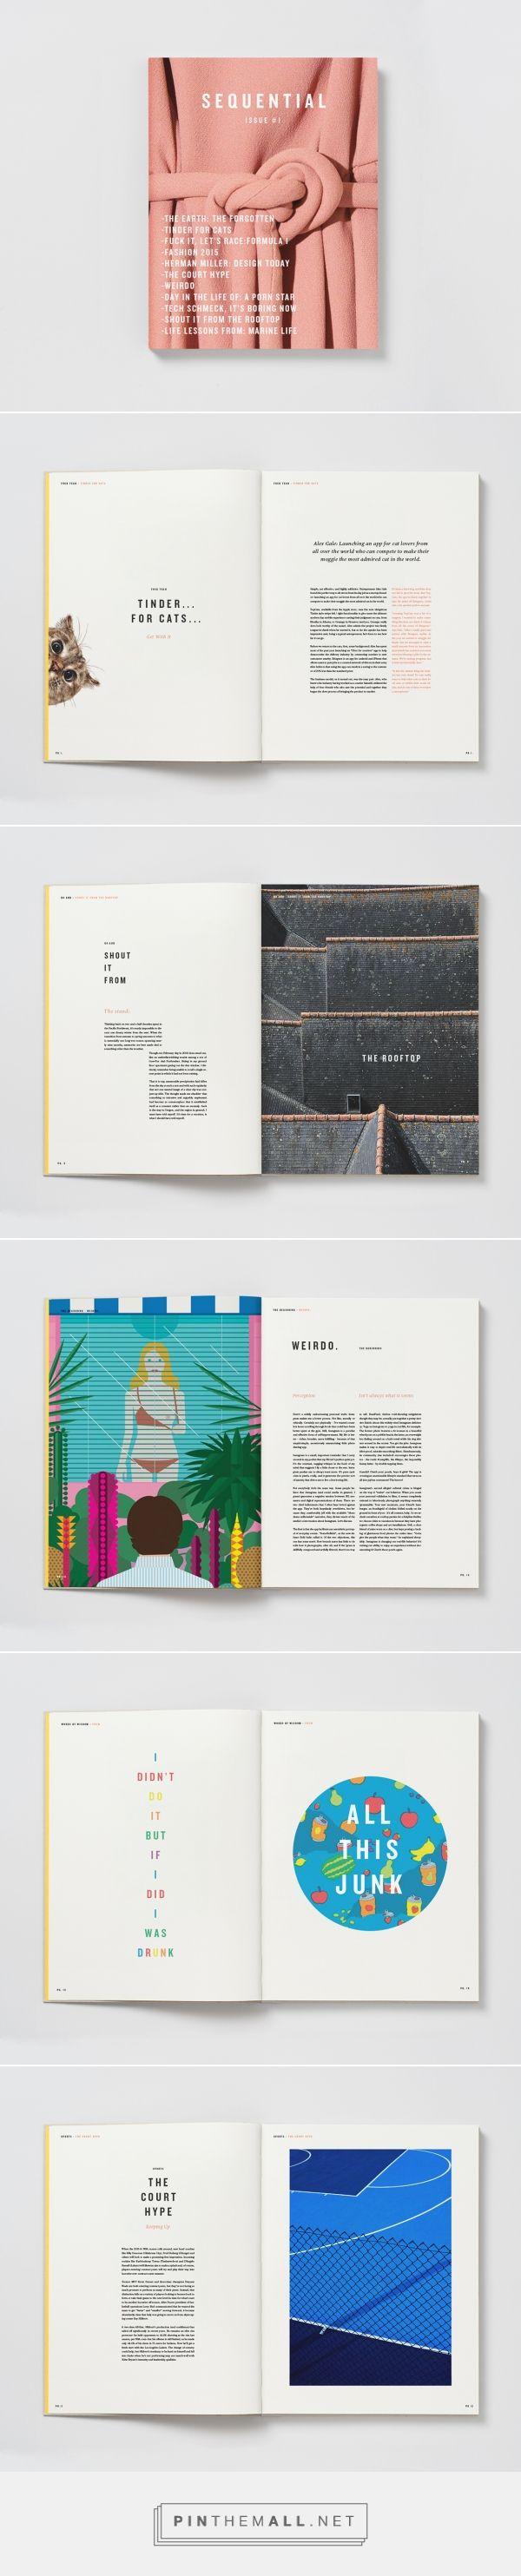 The Design Blog - Design Inspiration